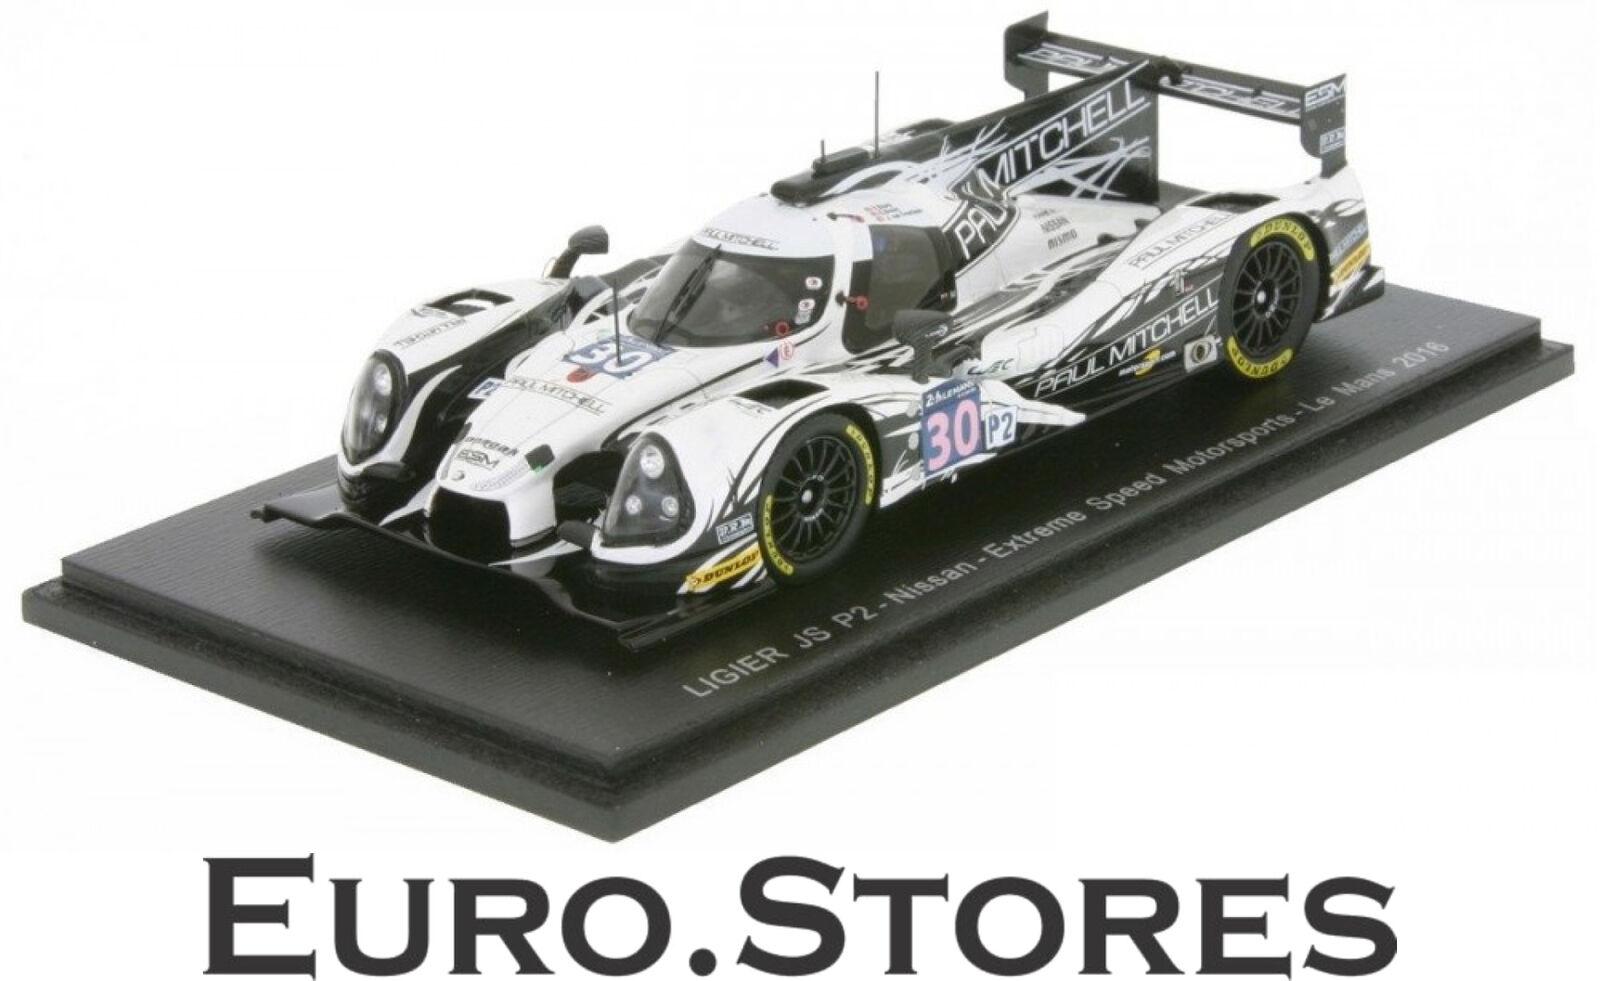 Spark Ligier JSP2 Nissan 24 H Le Mans 2018 Sharp Marrón Overbeek Coche Modelo 143